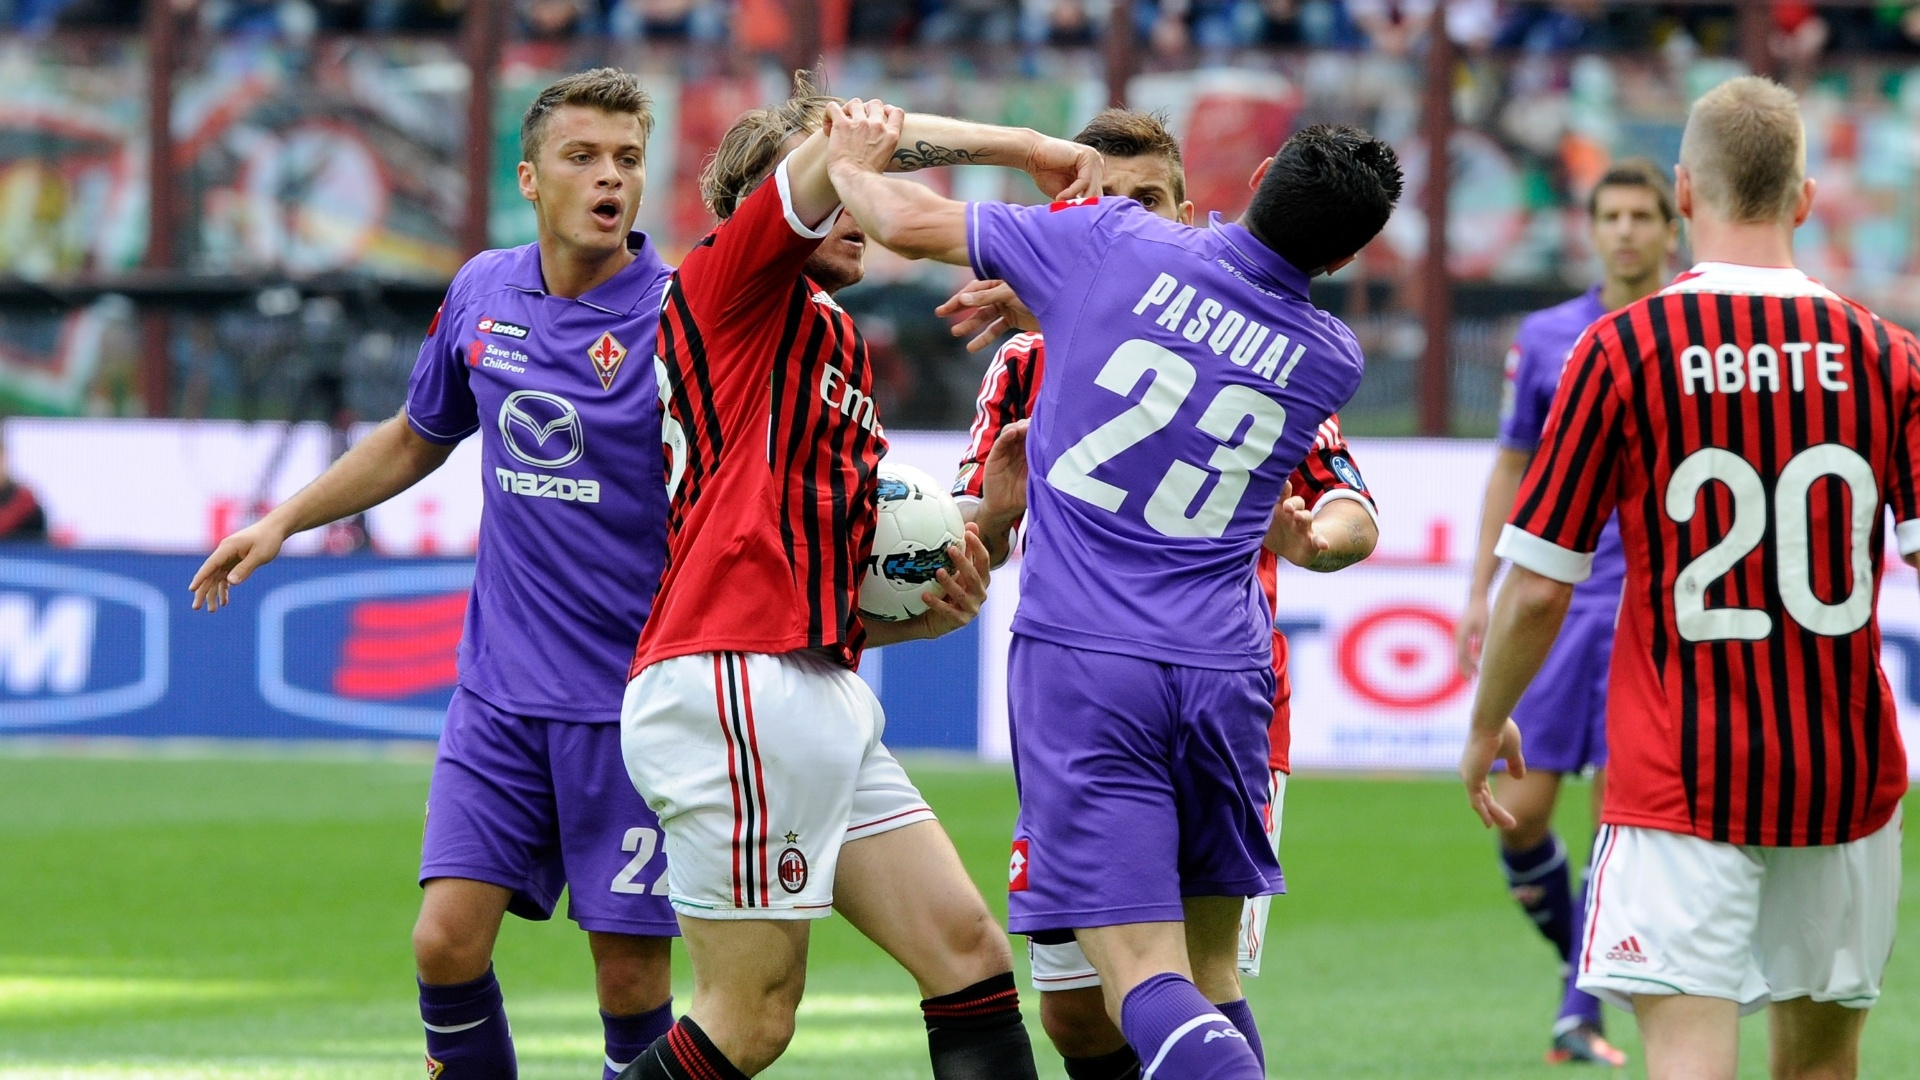 Jogadores de Milan e Fiorentina se empurram durante partida realizada no estádio San Siro e vencida de virada pelos visitantes